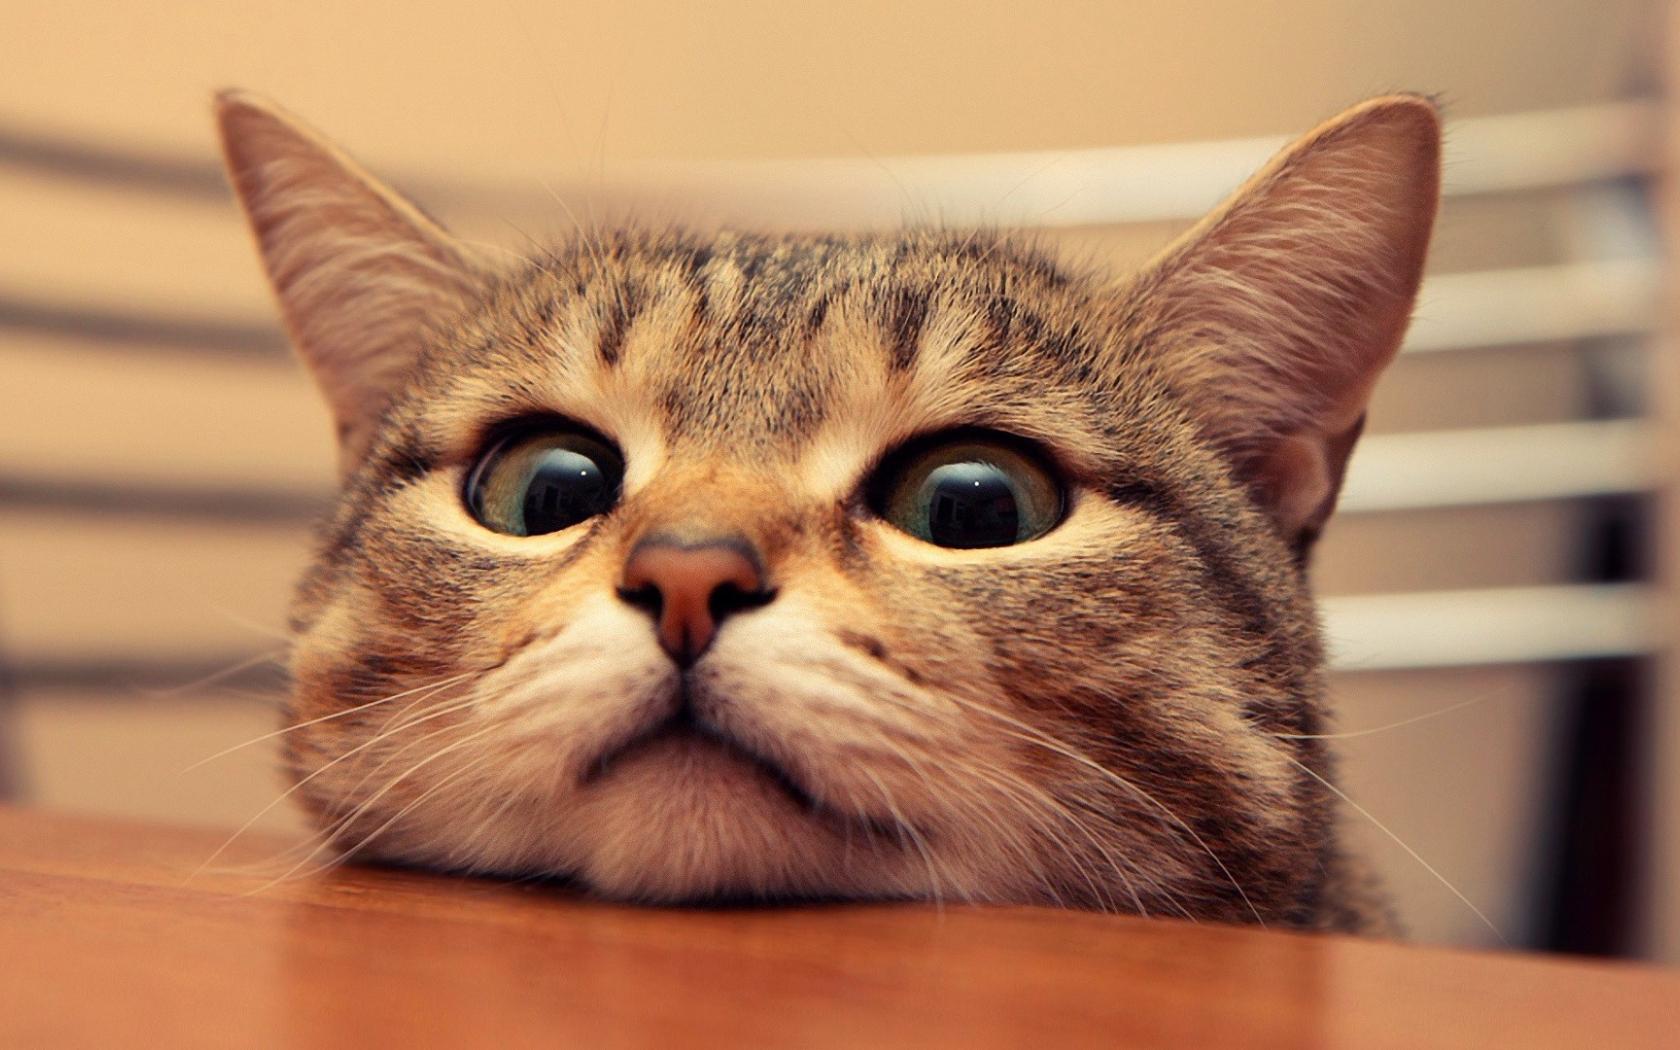 Free Download Cute Wallpapers Cat Wallpaper 1920x1080 1920x1080 For Your Desktop Mobile Tablet Explore 48 Kawaii Cat Wallpaper Cute Black Cat Wallpaper Cats Wallpaper Free For 2013 Kawaii Wallpaper Hd